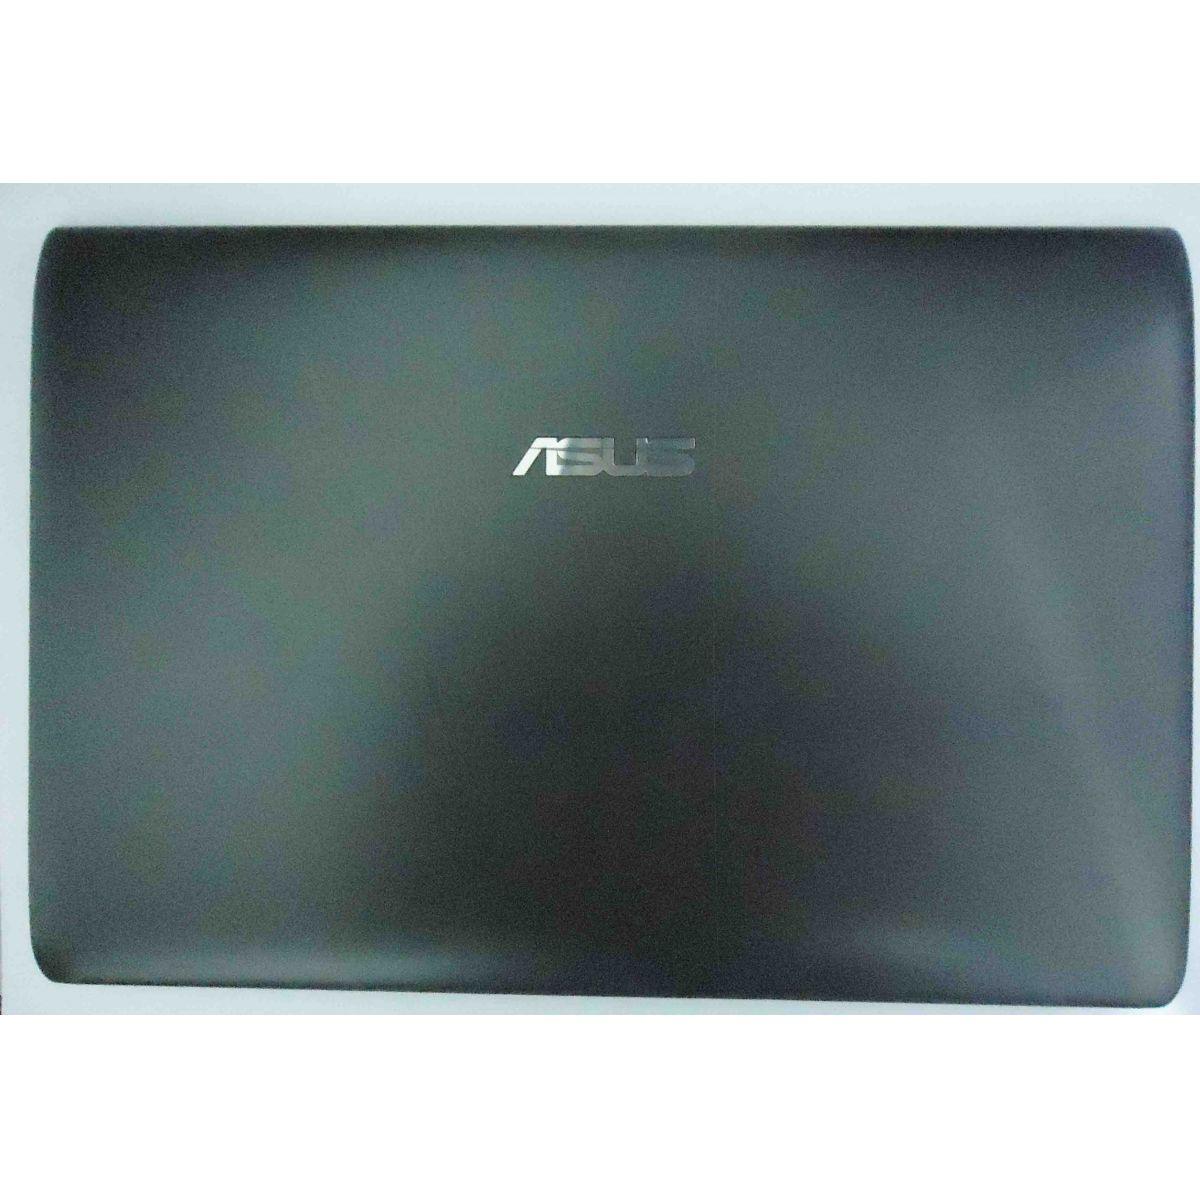 Carcaça Tampa Moldura Netbook Asus EEE PC 1025c